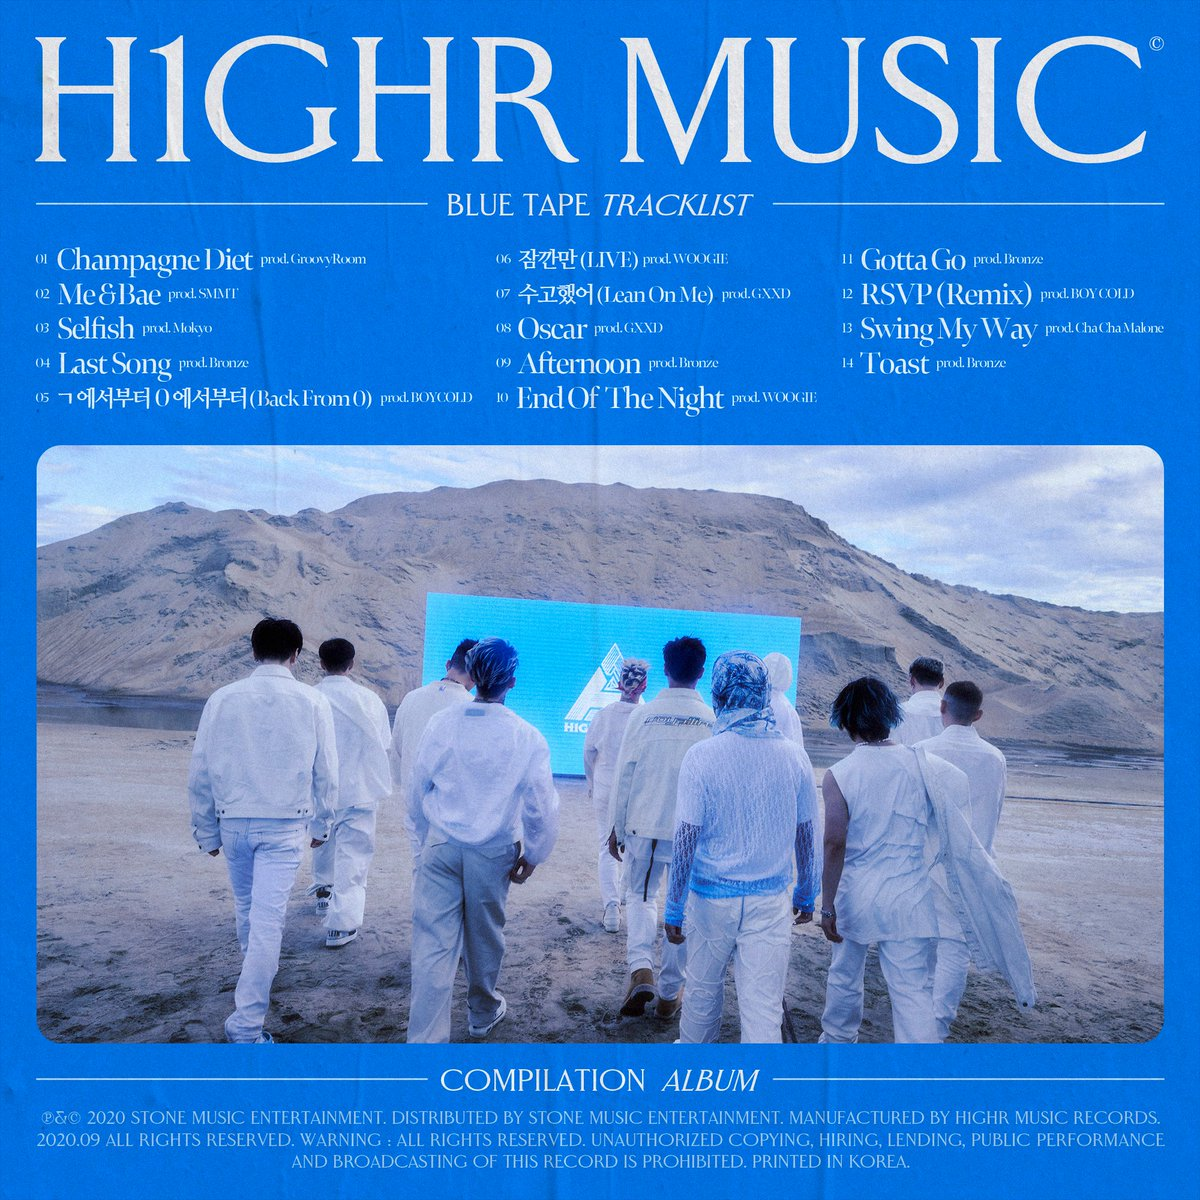 D-7 TRACKLIST 🔥🔥 2020.09.16 [H1GHR : BLUE TAPE] ⠀ THE FRESH 14 TRACKS ⠀ #BLUE_TAPE #ComingUp #컴필레이션 #Compilation #H1GHRMUSIC #하이어뮤직 https://t.co/80J6IoCLRt